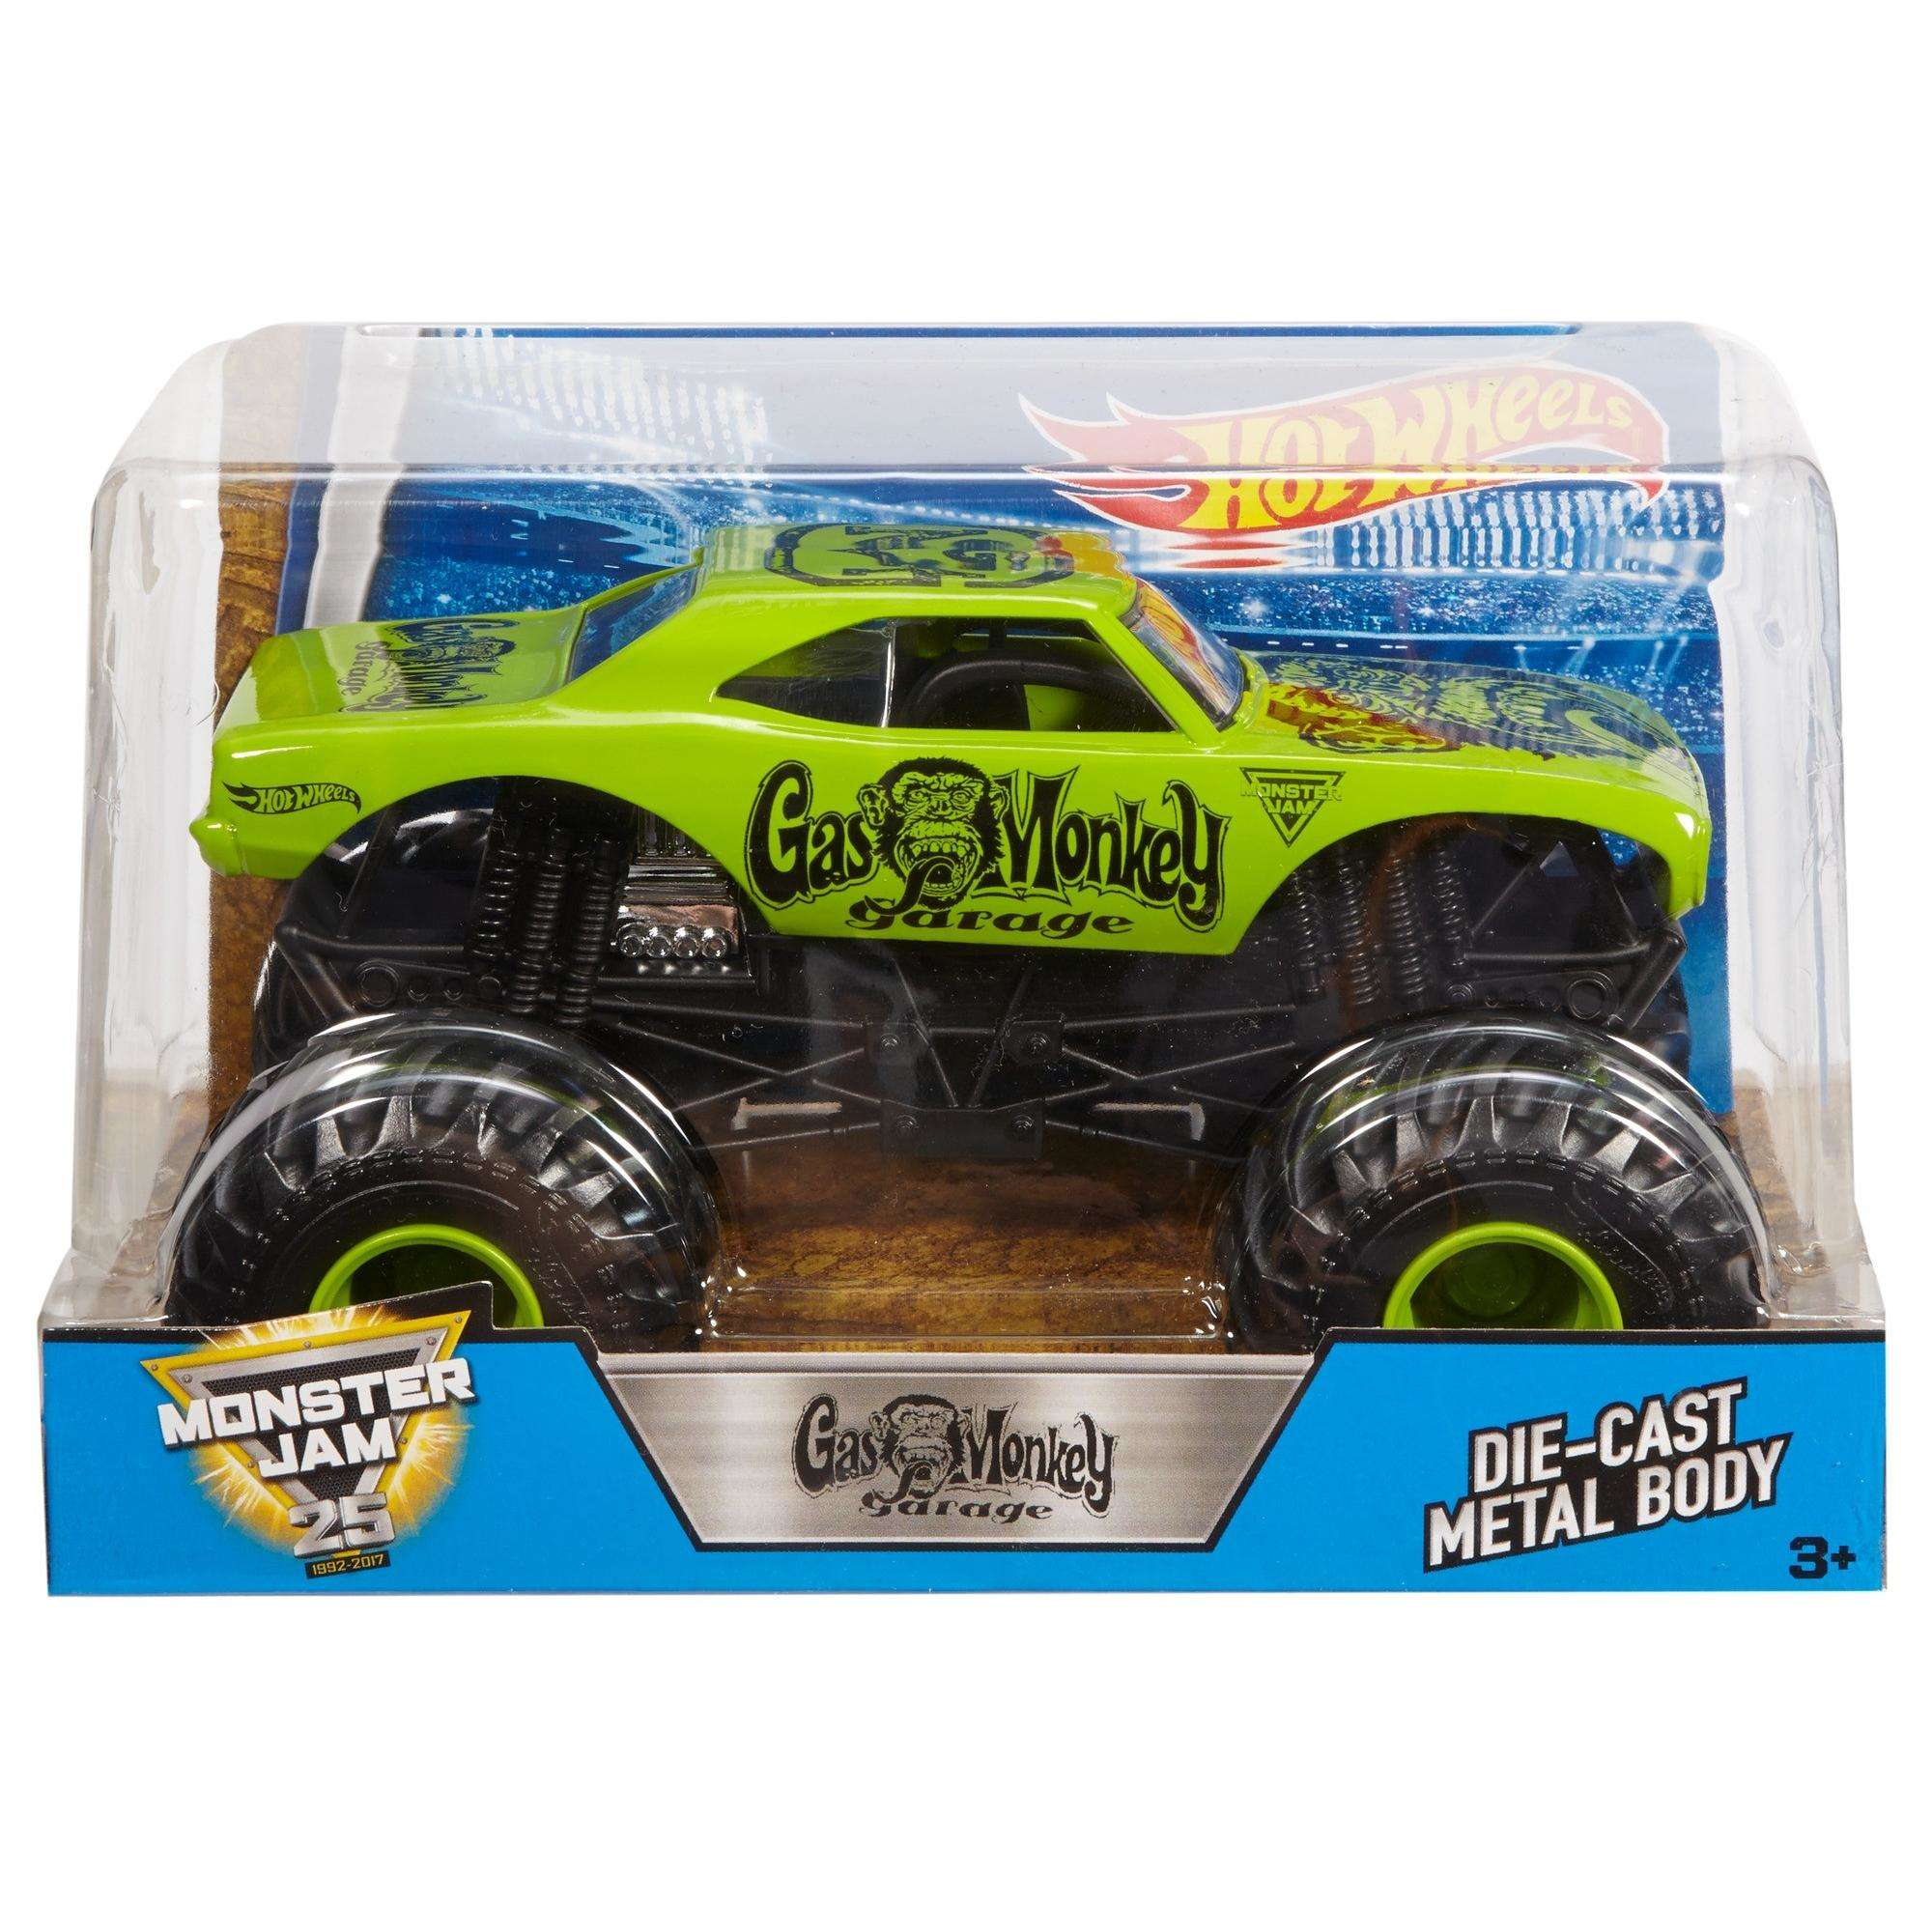 Hot Wheels Monster Jam Gas Monkey Vehicle by Mattel